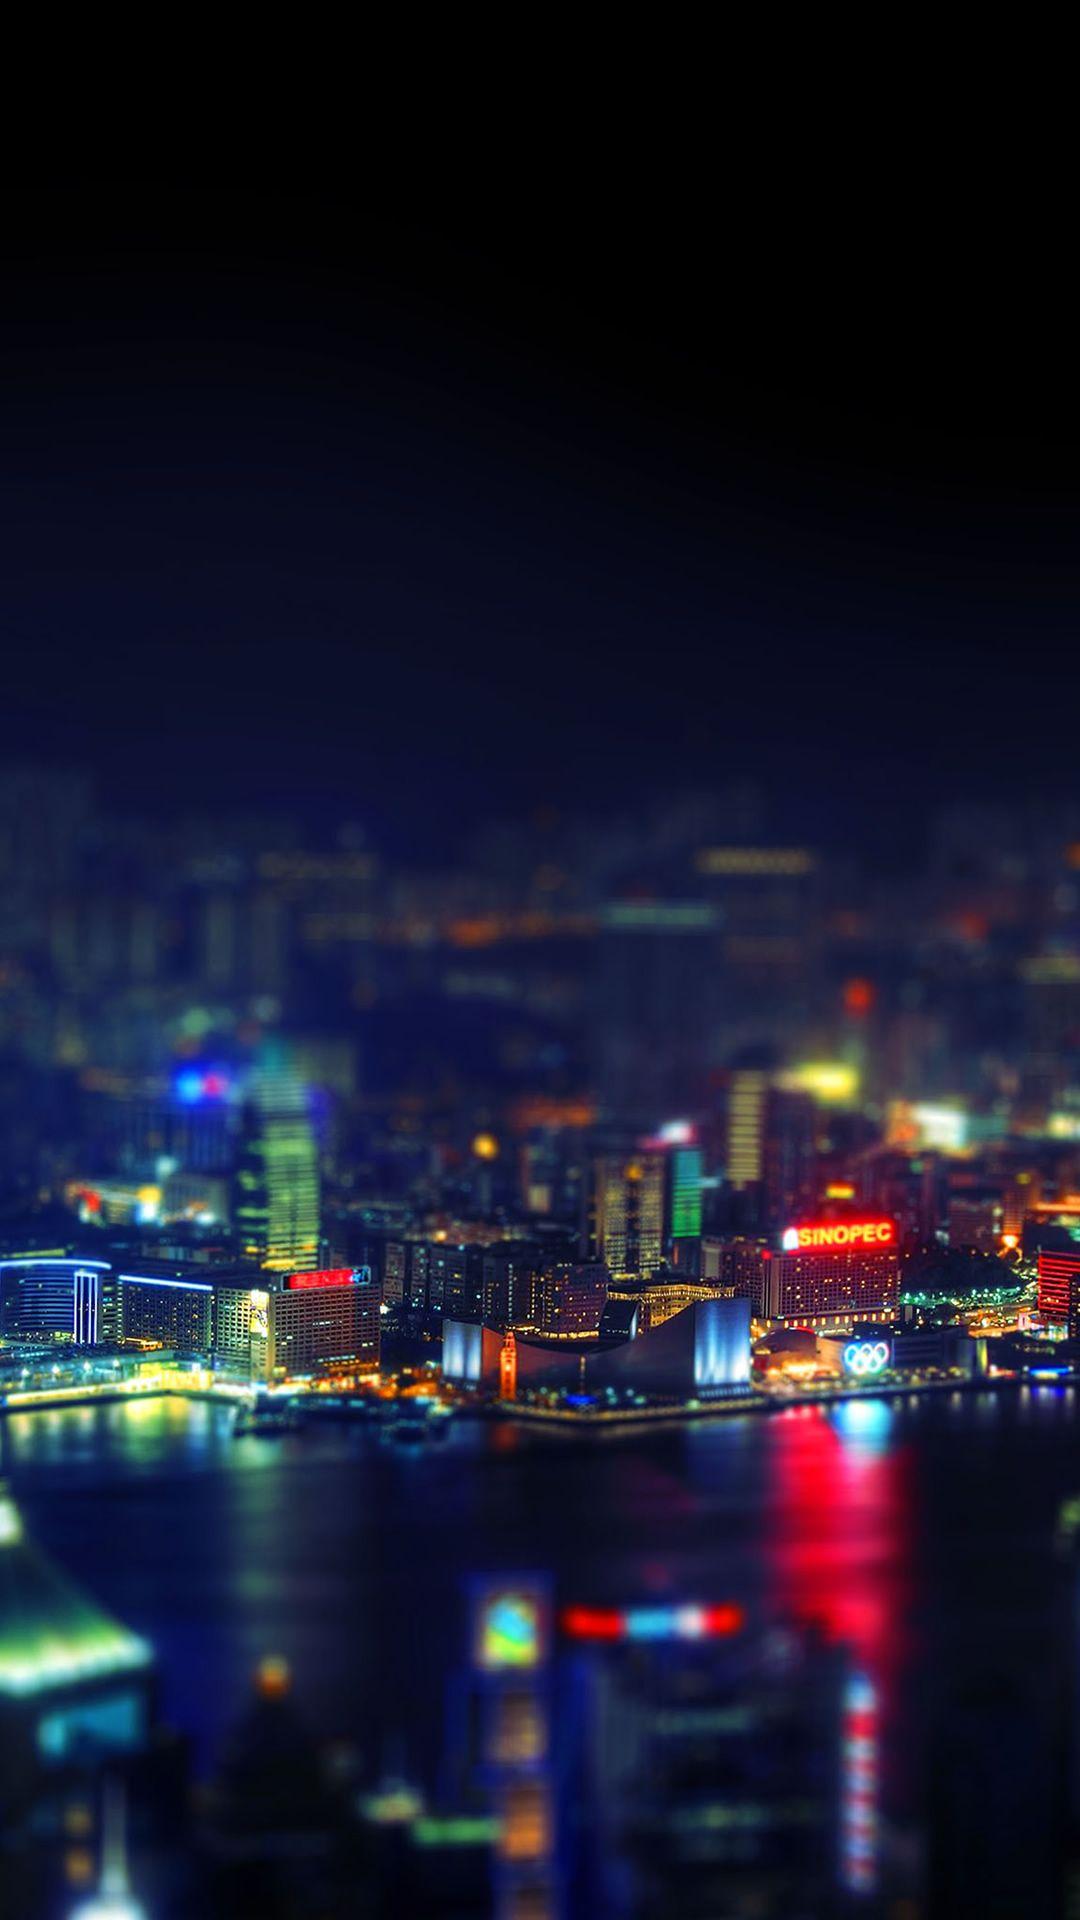 Hongkong Night Cityscape Light Iphone 8 Wallpapers Iphone 6s